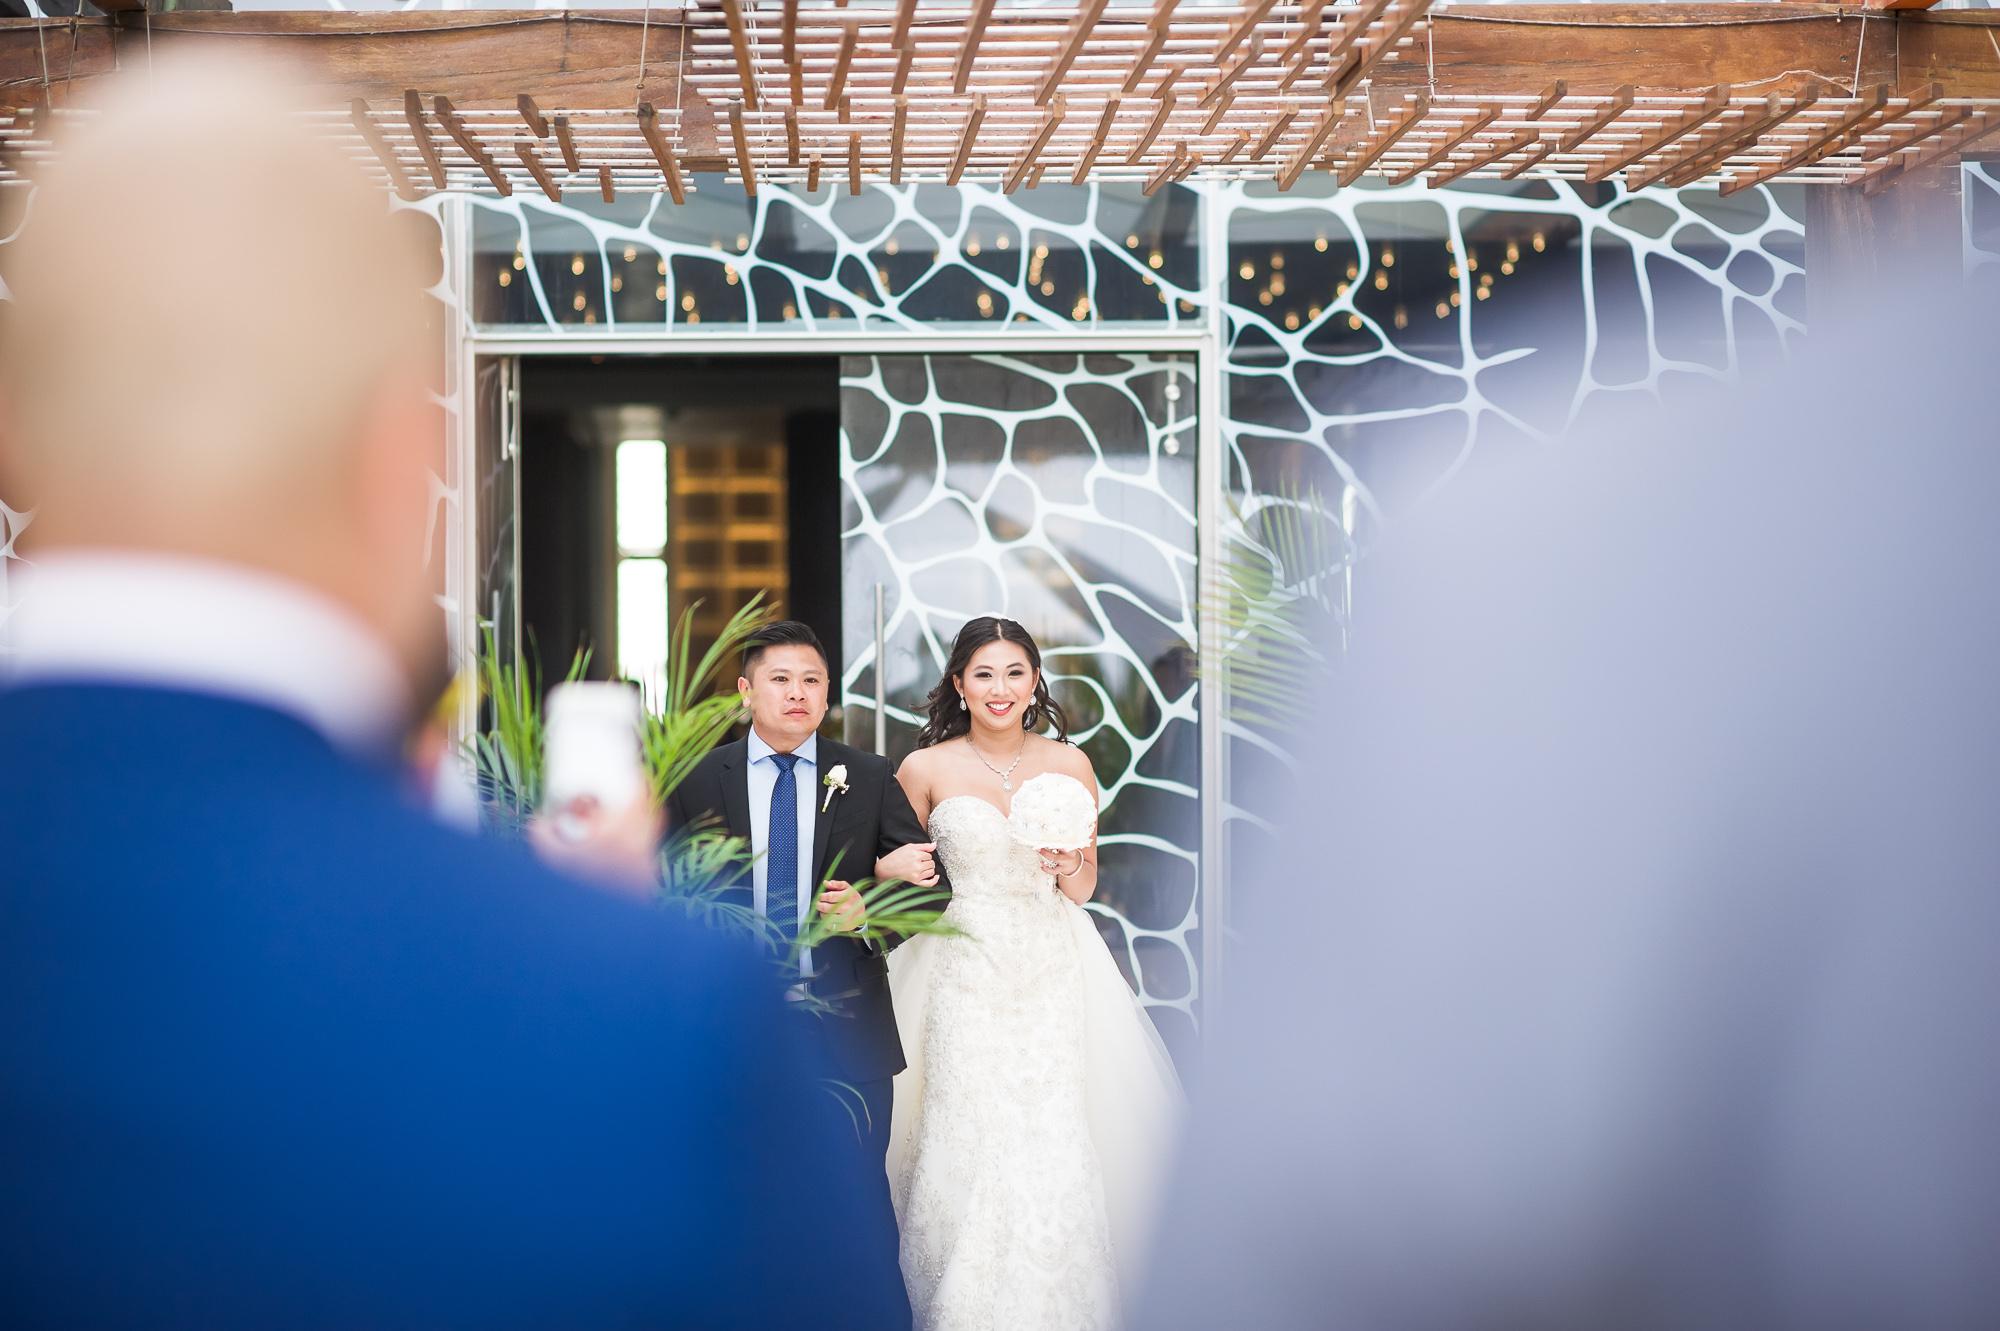 23-David Loi Studios - Cancun - Mexico - Destination Wedding-15535.jpg